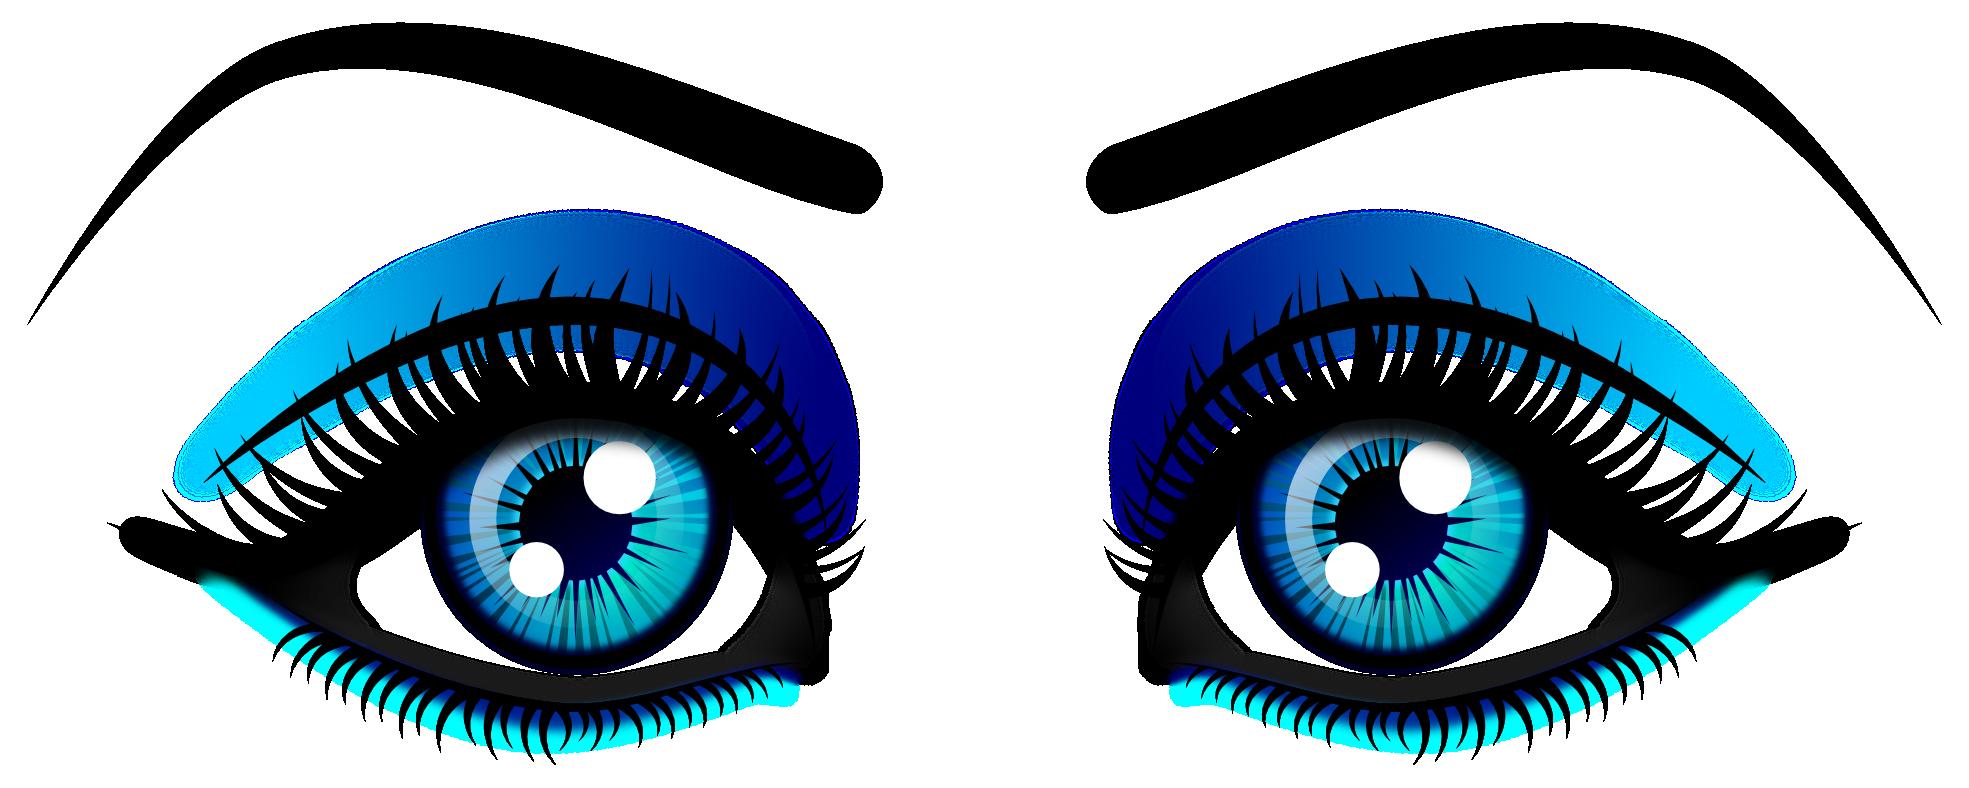 eye png transparent eye images. | pluspng